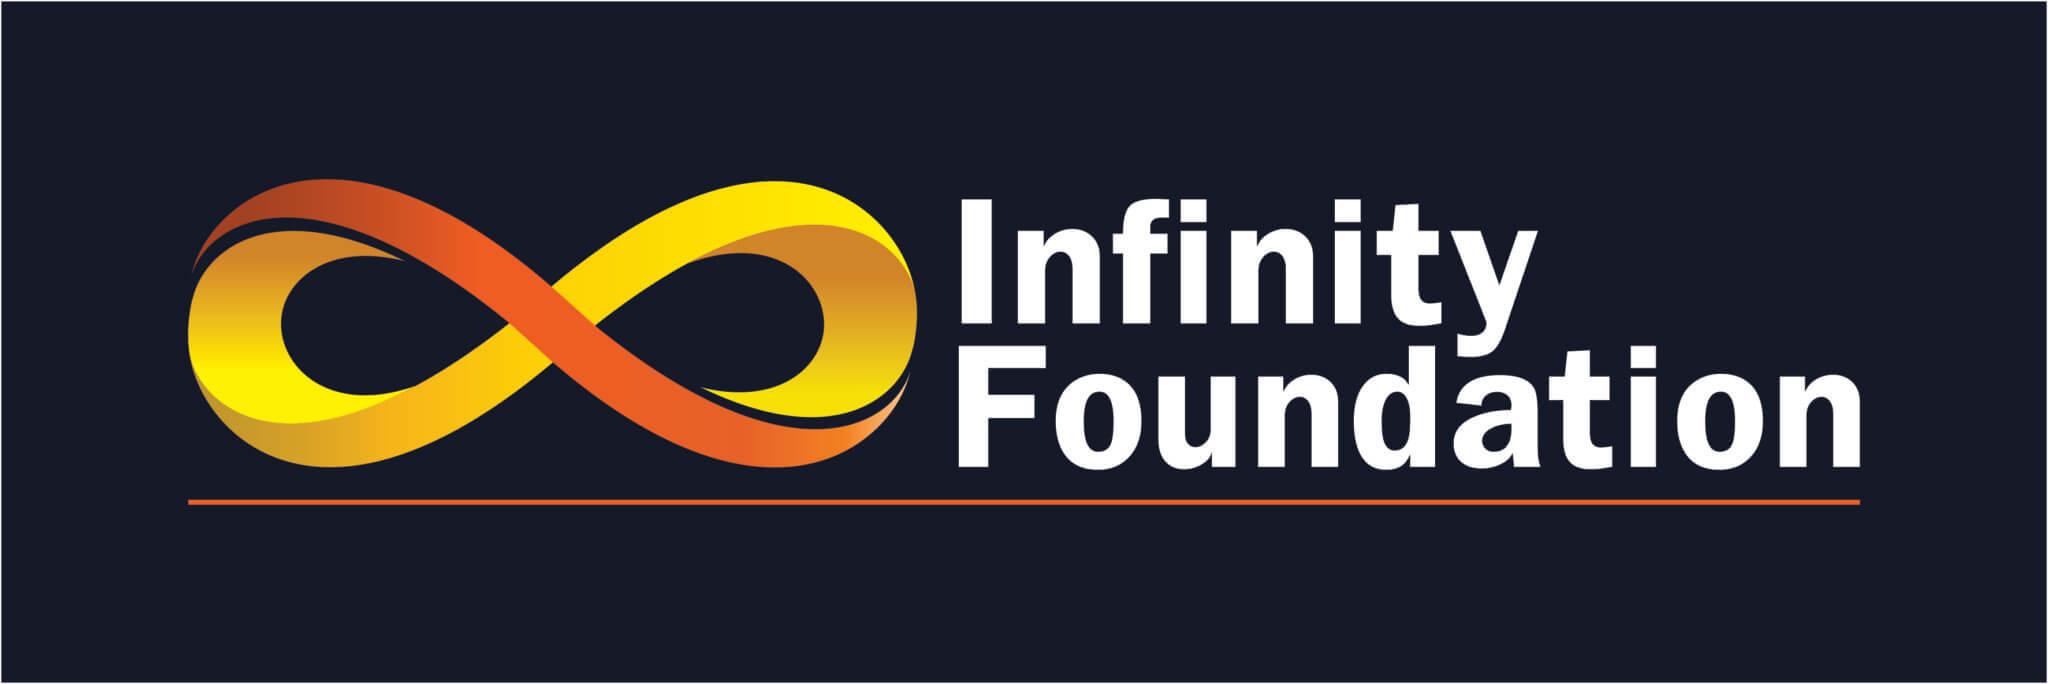 Infinity-Foundation-logo